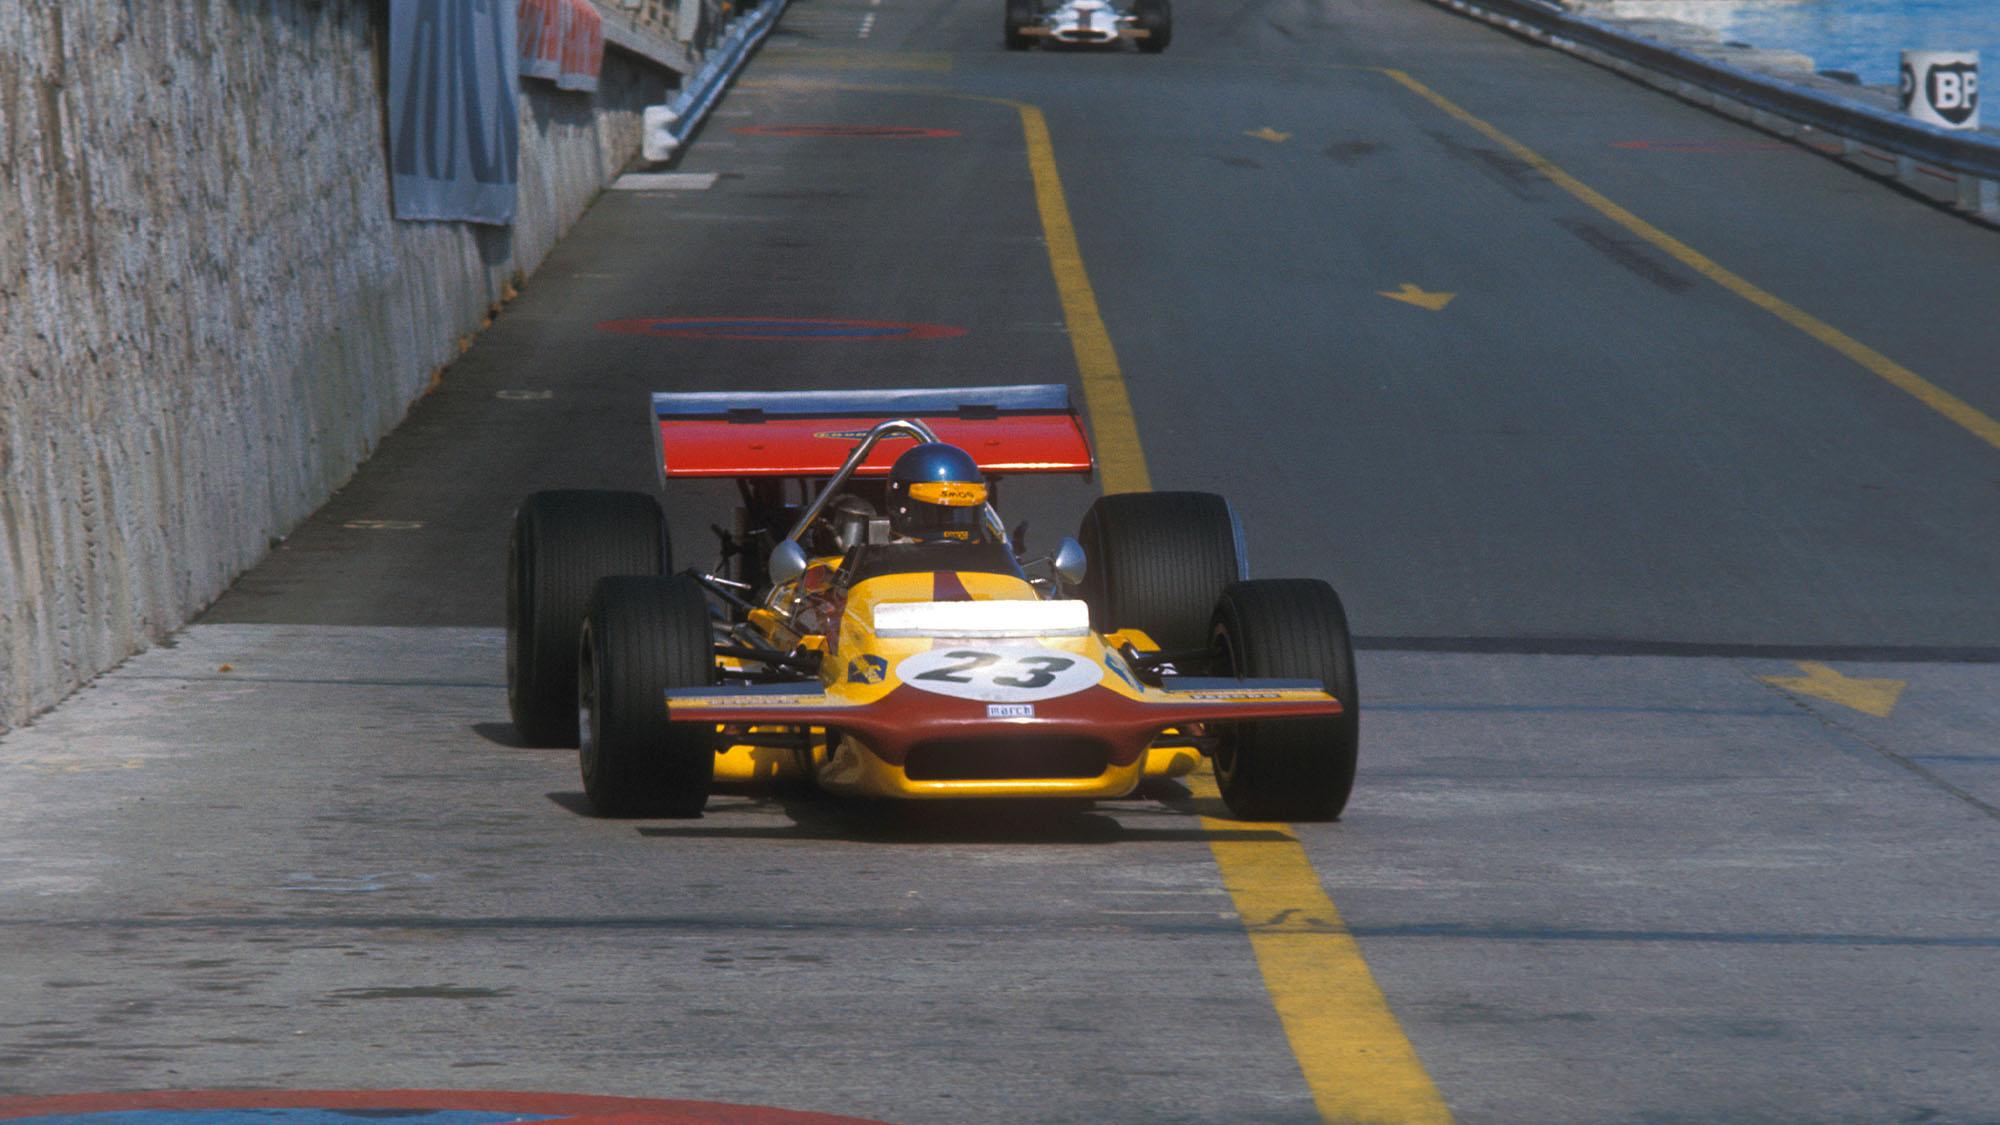 Peterson 1970 Monaco